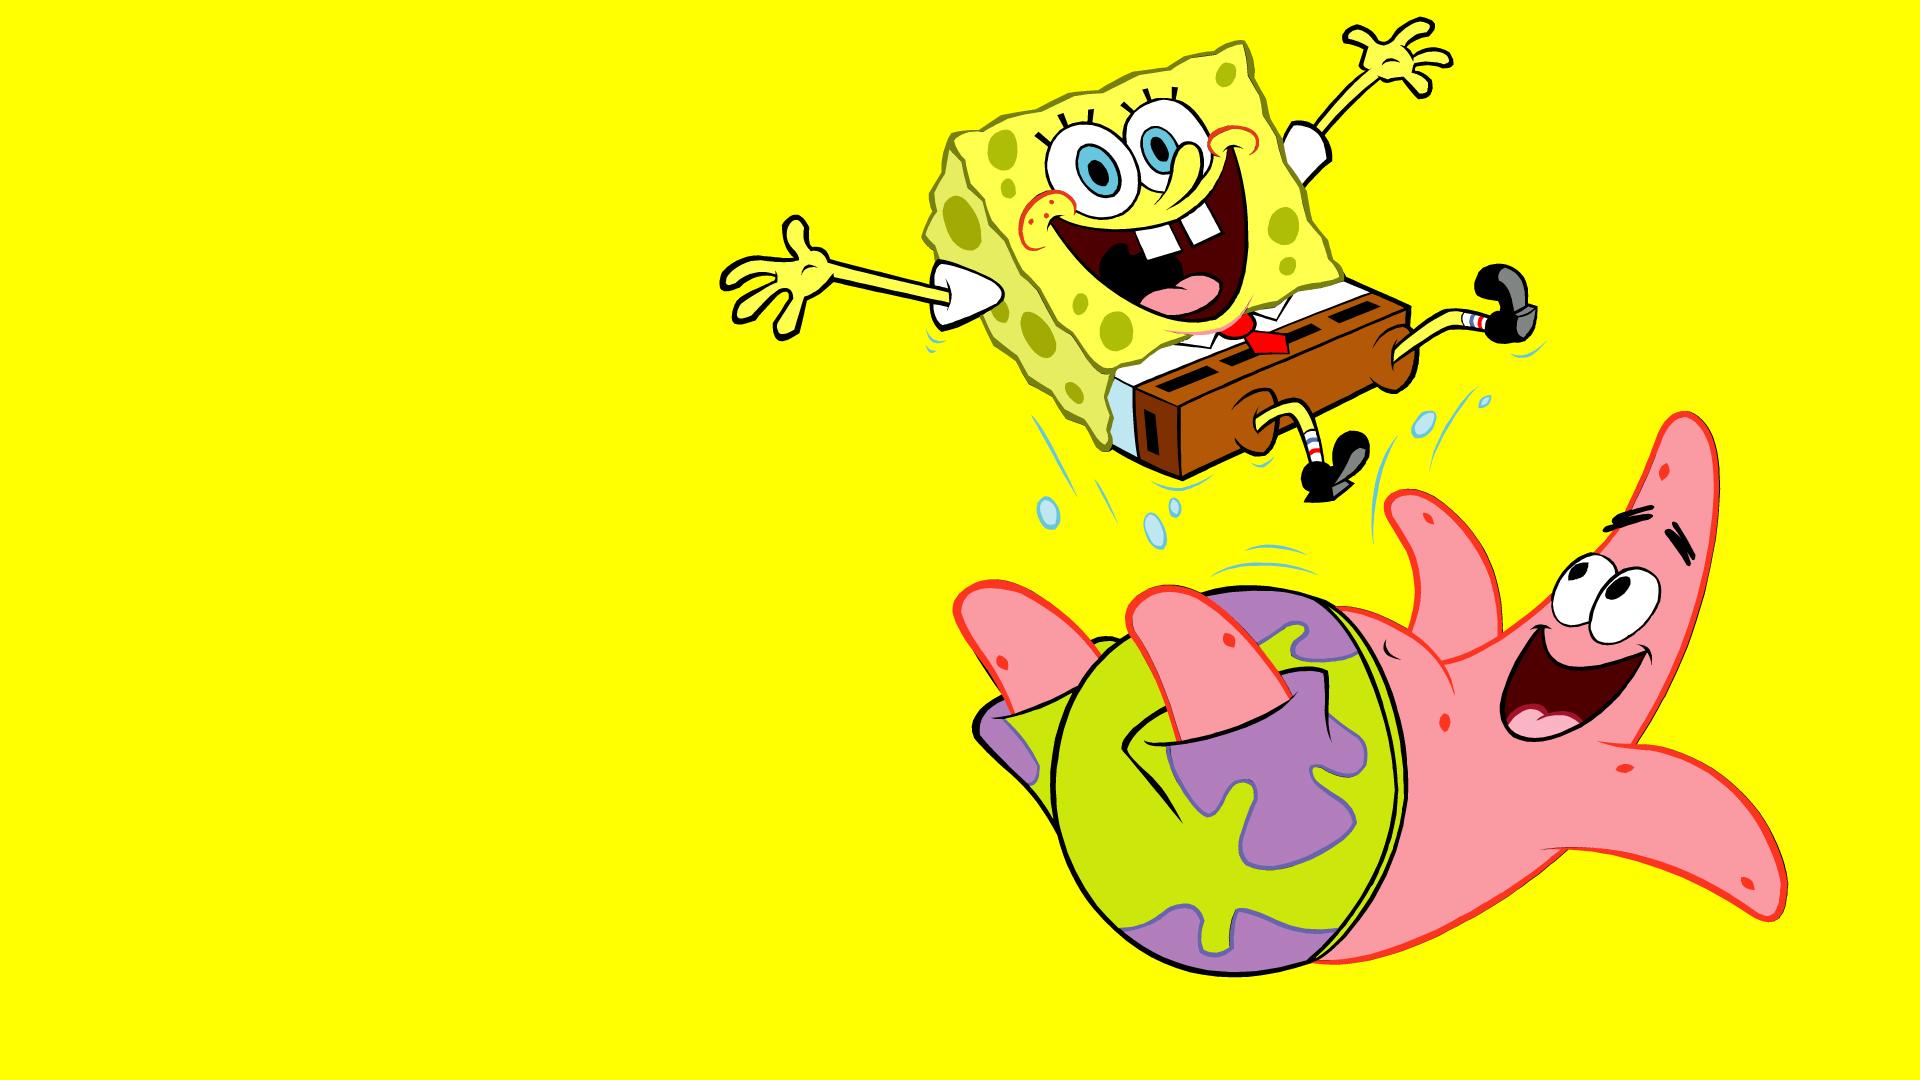 Patrick Star 3d Wallpaper Spongebob Backgrounds Free Download Pixelstalk Net